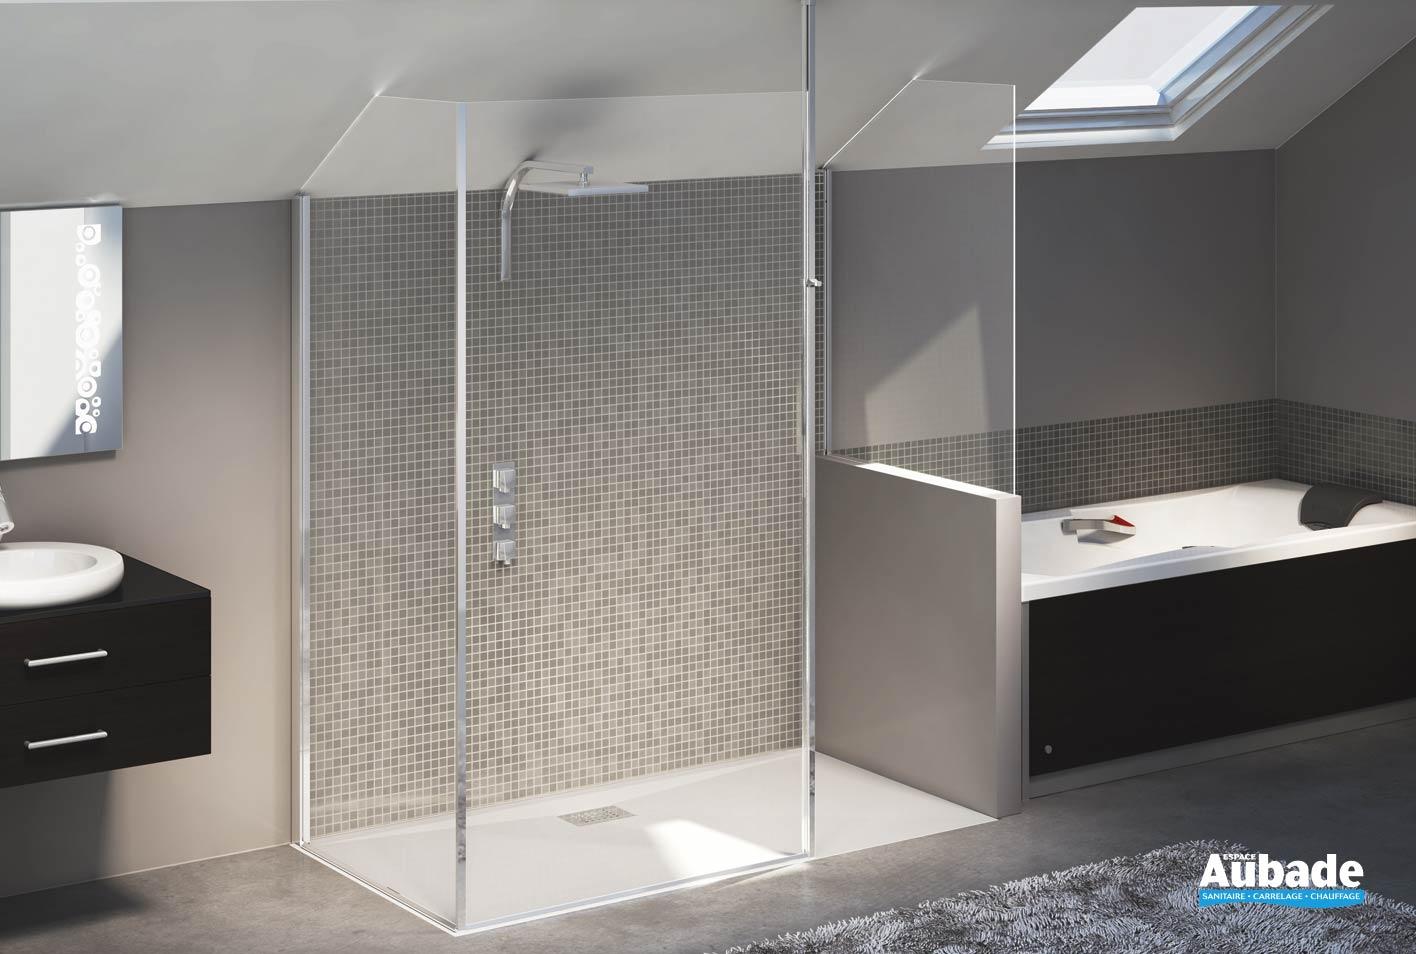 paroi de douche sur mesure kinedo espace aubade. Black Bedroom Furniture Sets. Home Design Ideas